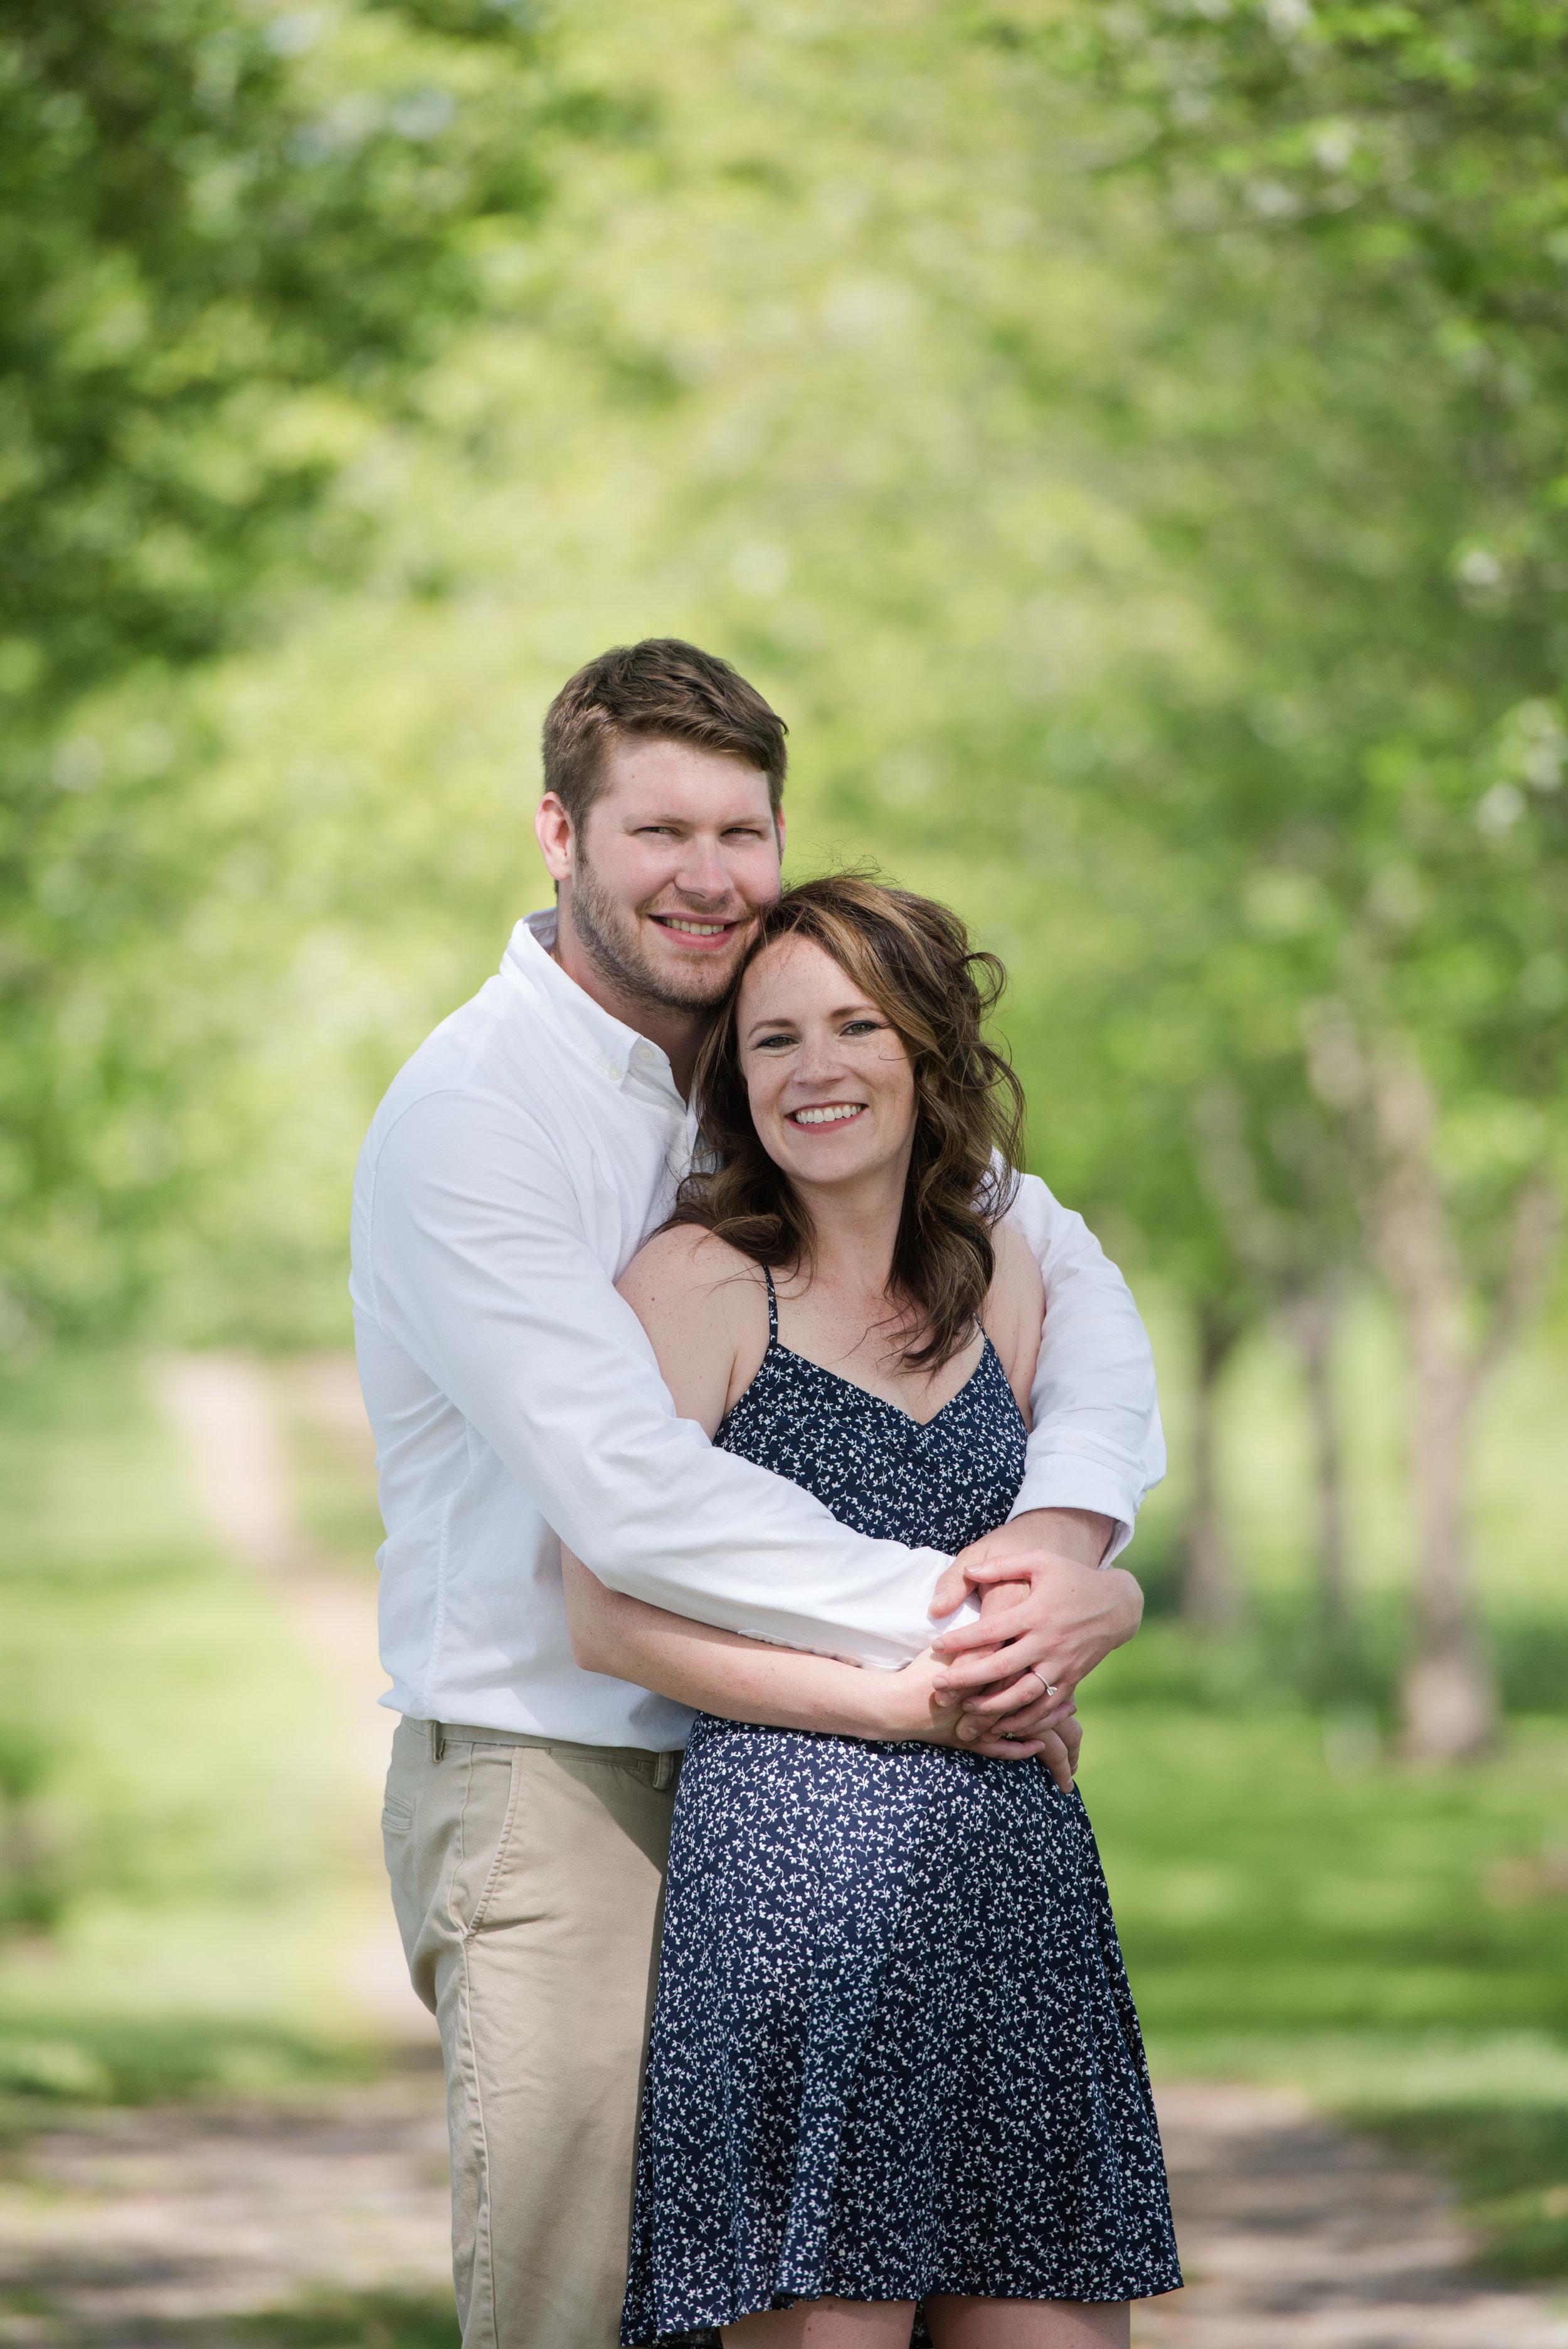 GALLERY-2019-6-9 Kaitlin, Justin & Liam Engagement 0891 135.jpg